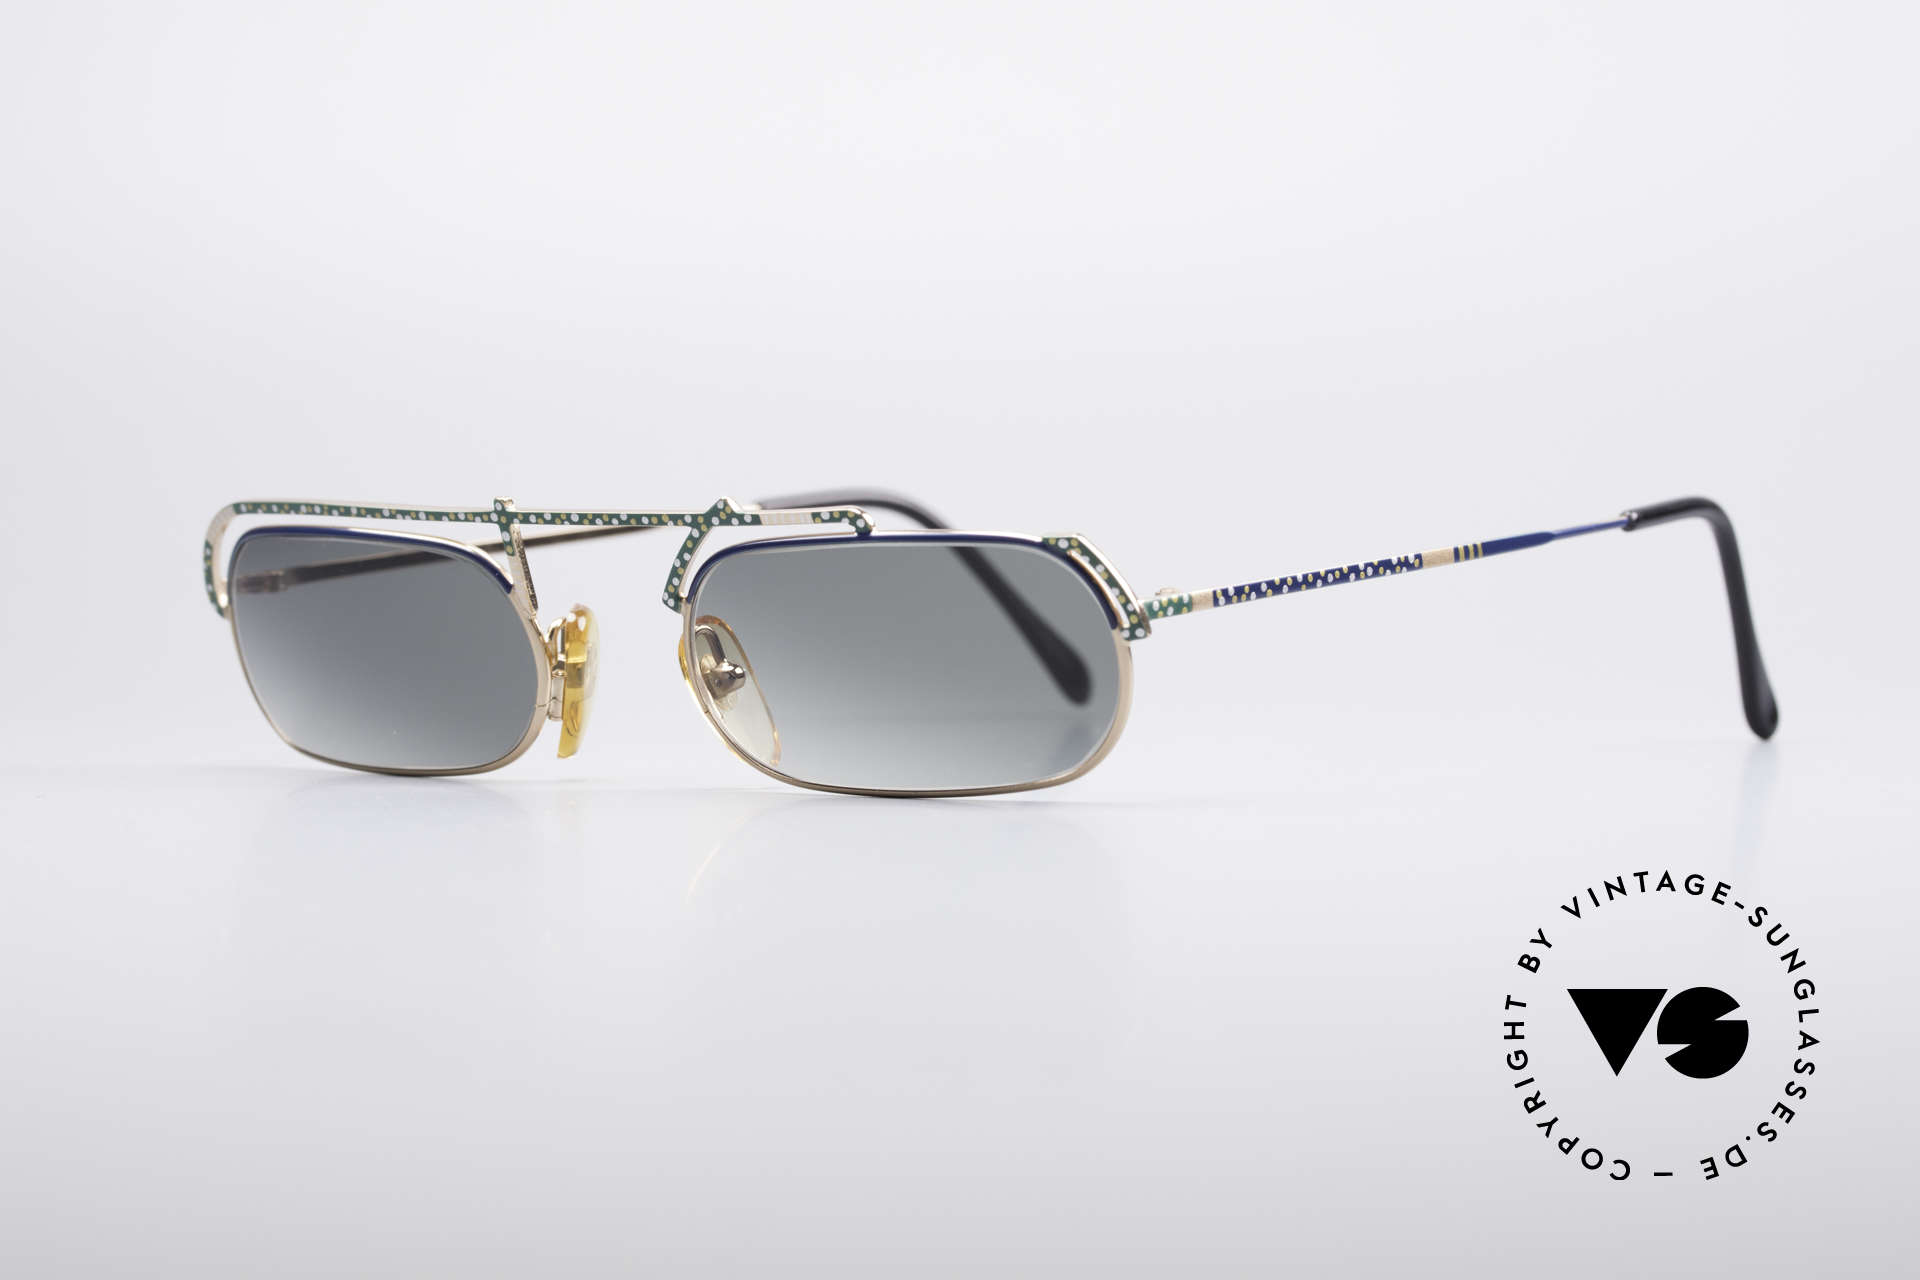 Casanova LC29 Artful 80's Sunglasses, blue-green-yellow-white dotted; a true eye-catcher, Made for Men and Women